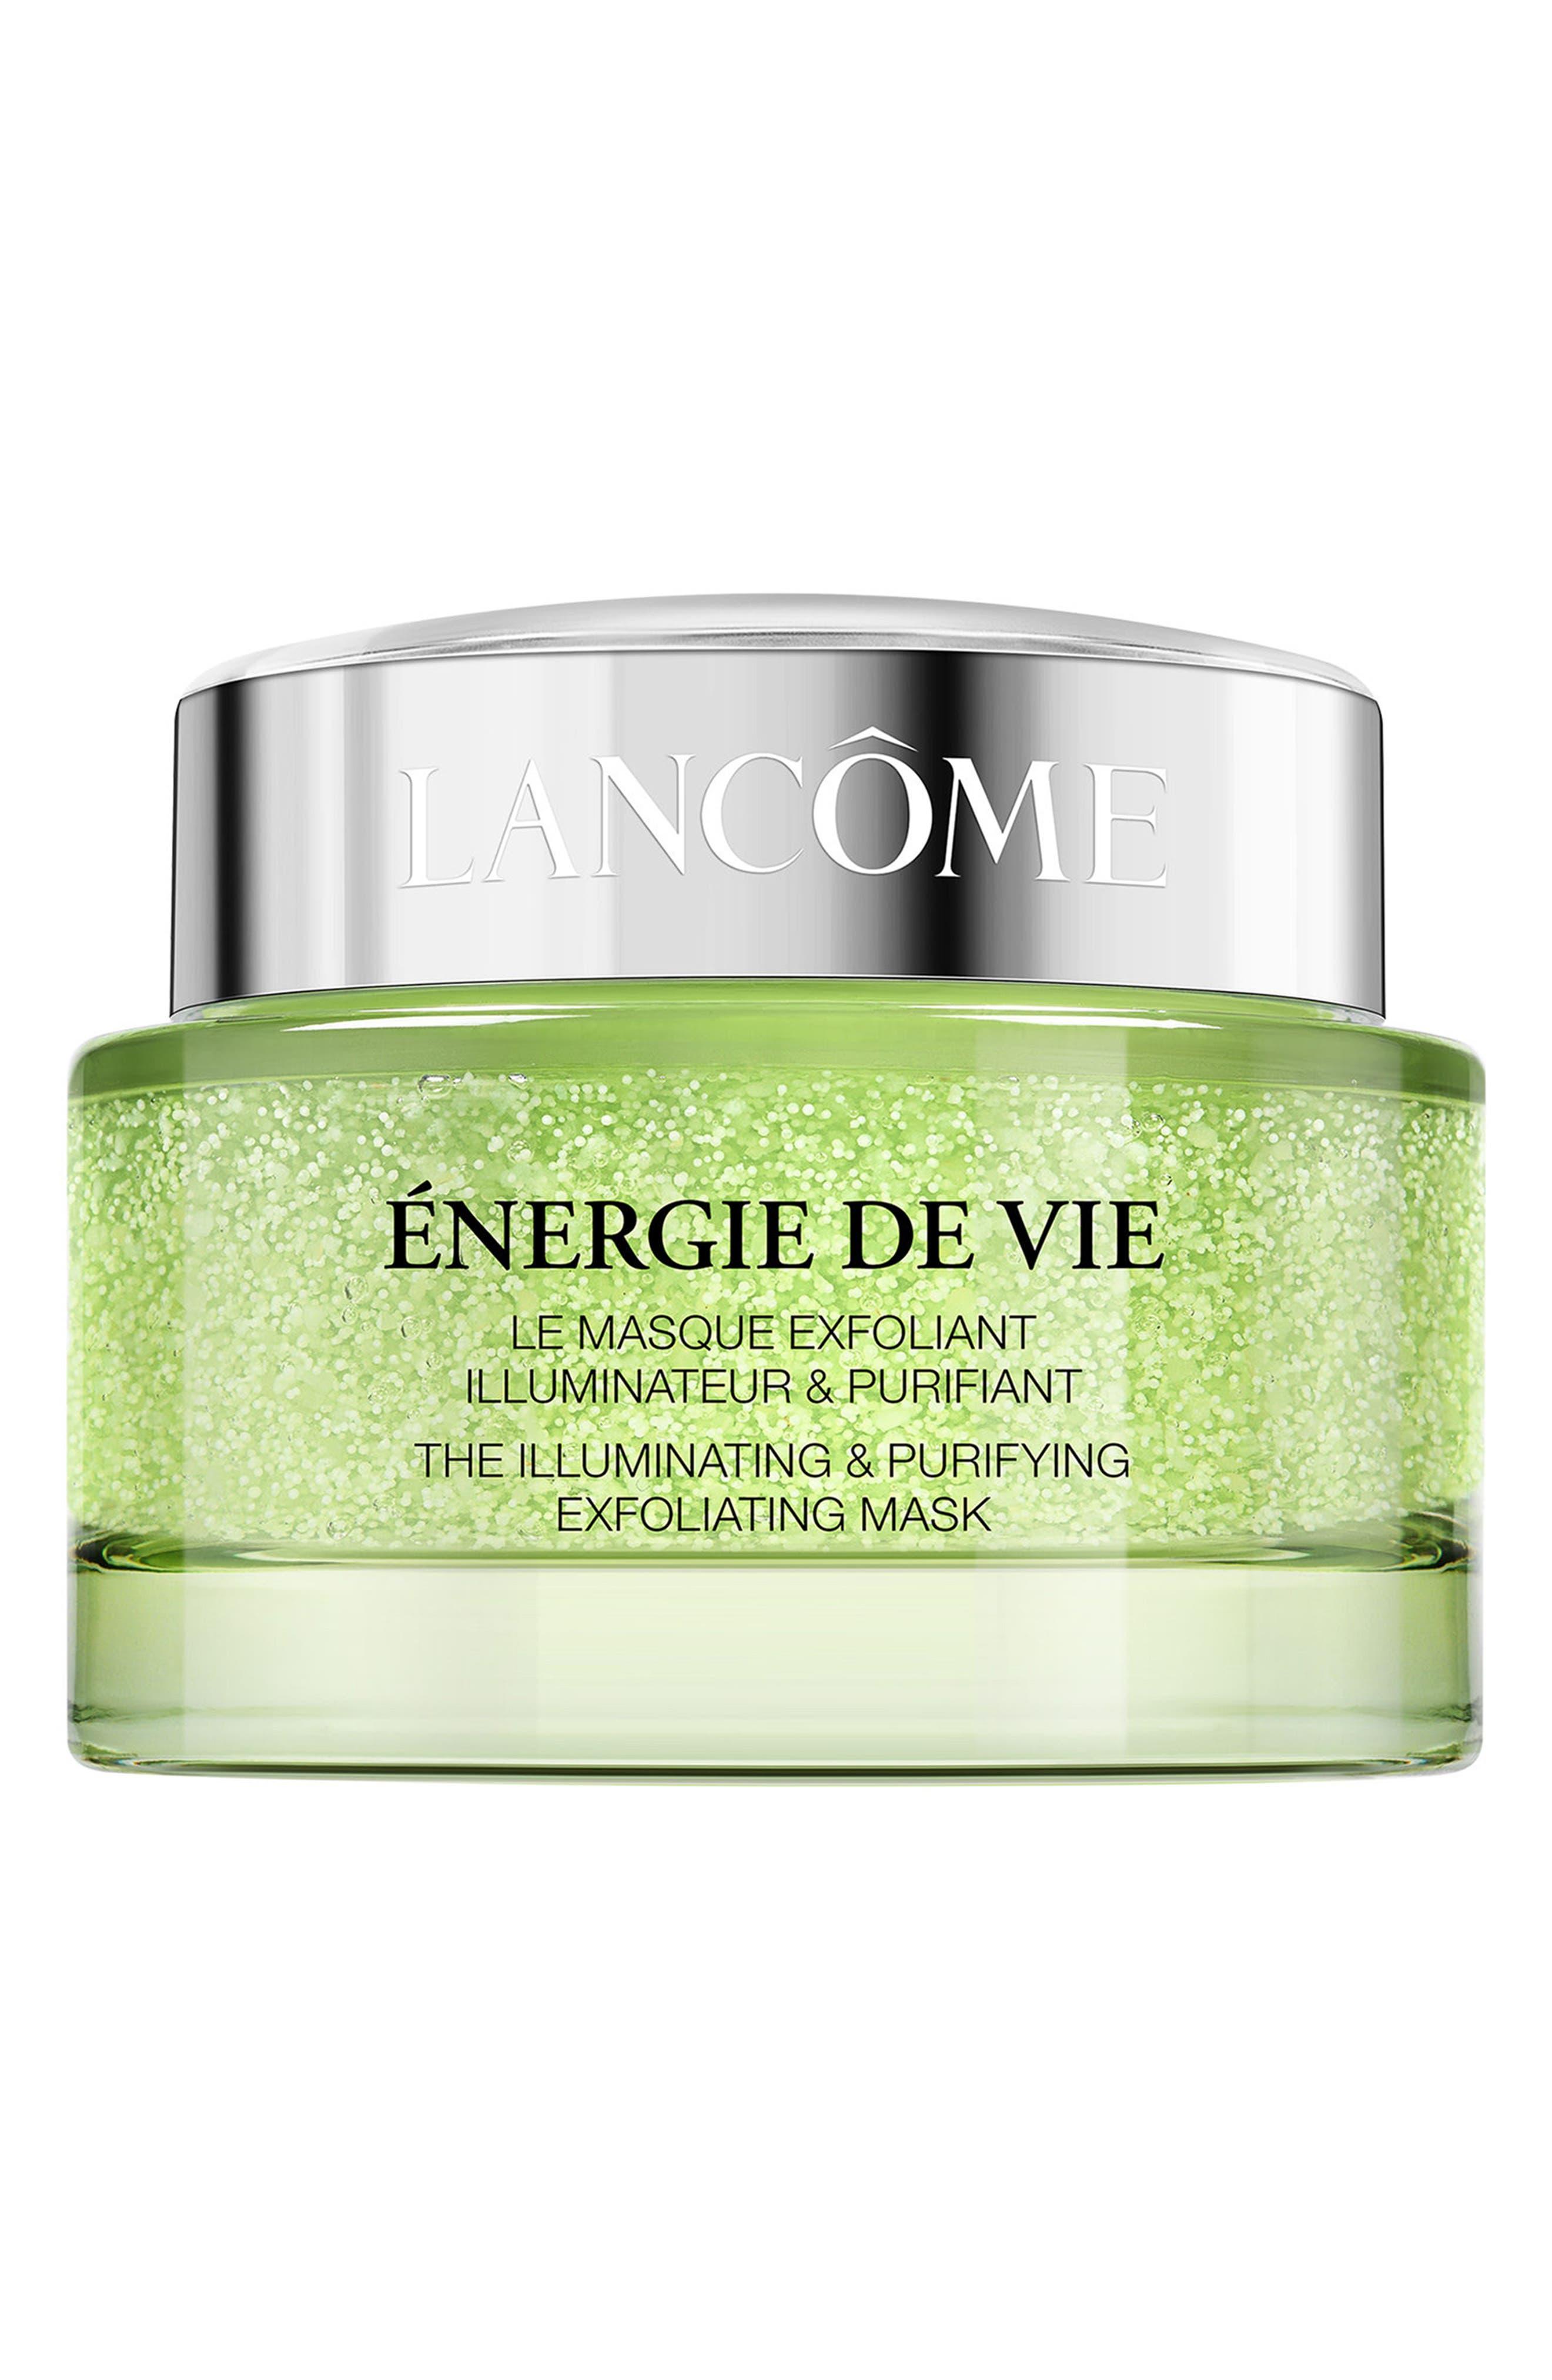 LANCÔME, Energie de Vie The Illuminating & Purifying Exfoliating Mask, Main thumbnail 1, color, NO COLOR